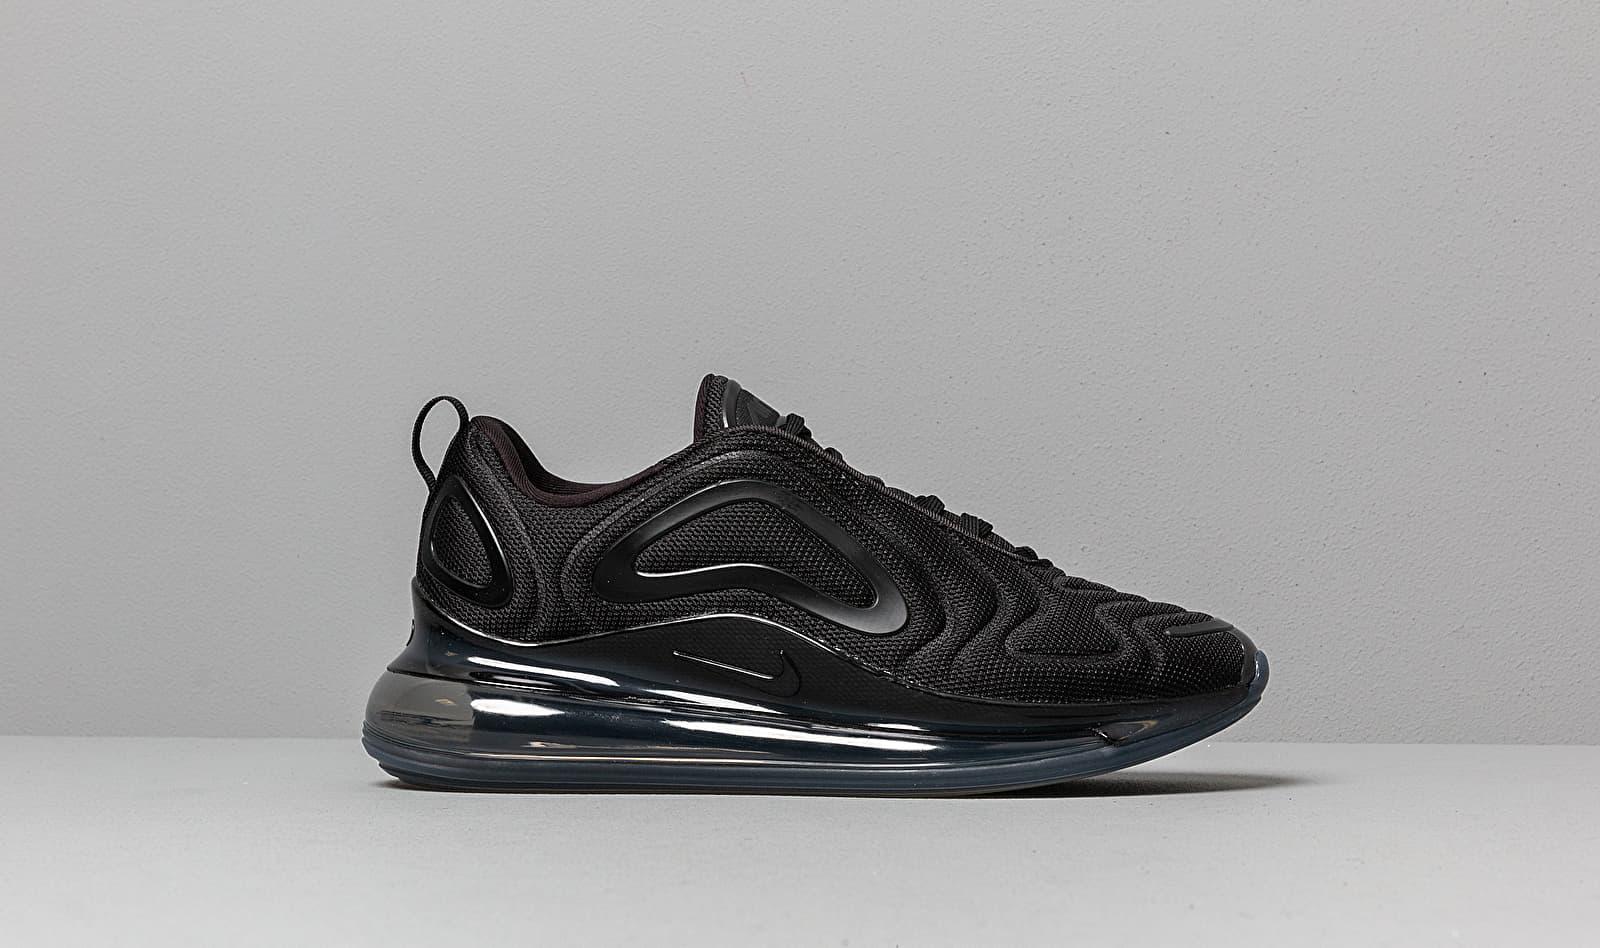 Air Max 720 Black/ Black-Anthracite Nike de hombre